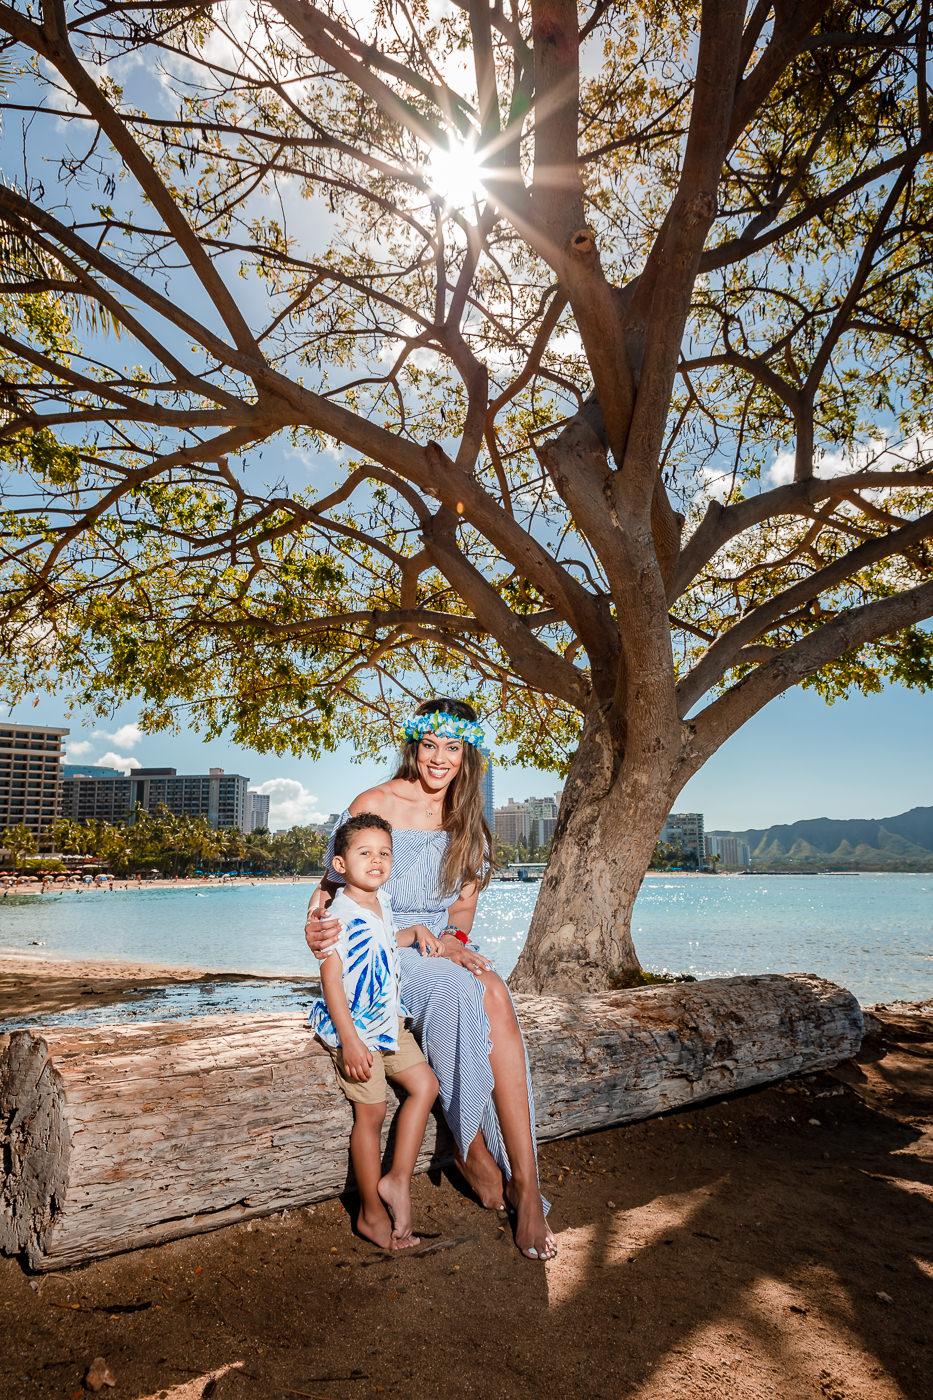 Oahu2019-3064.jpg